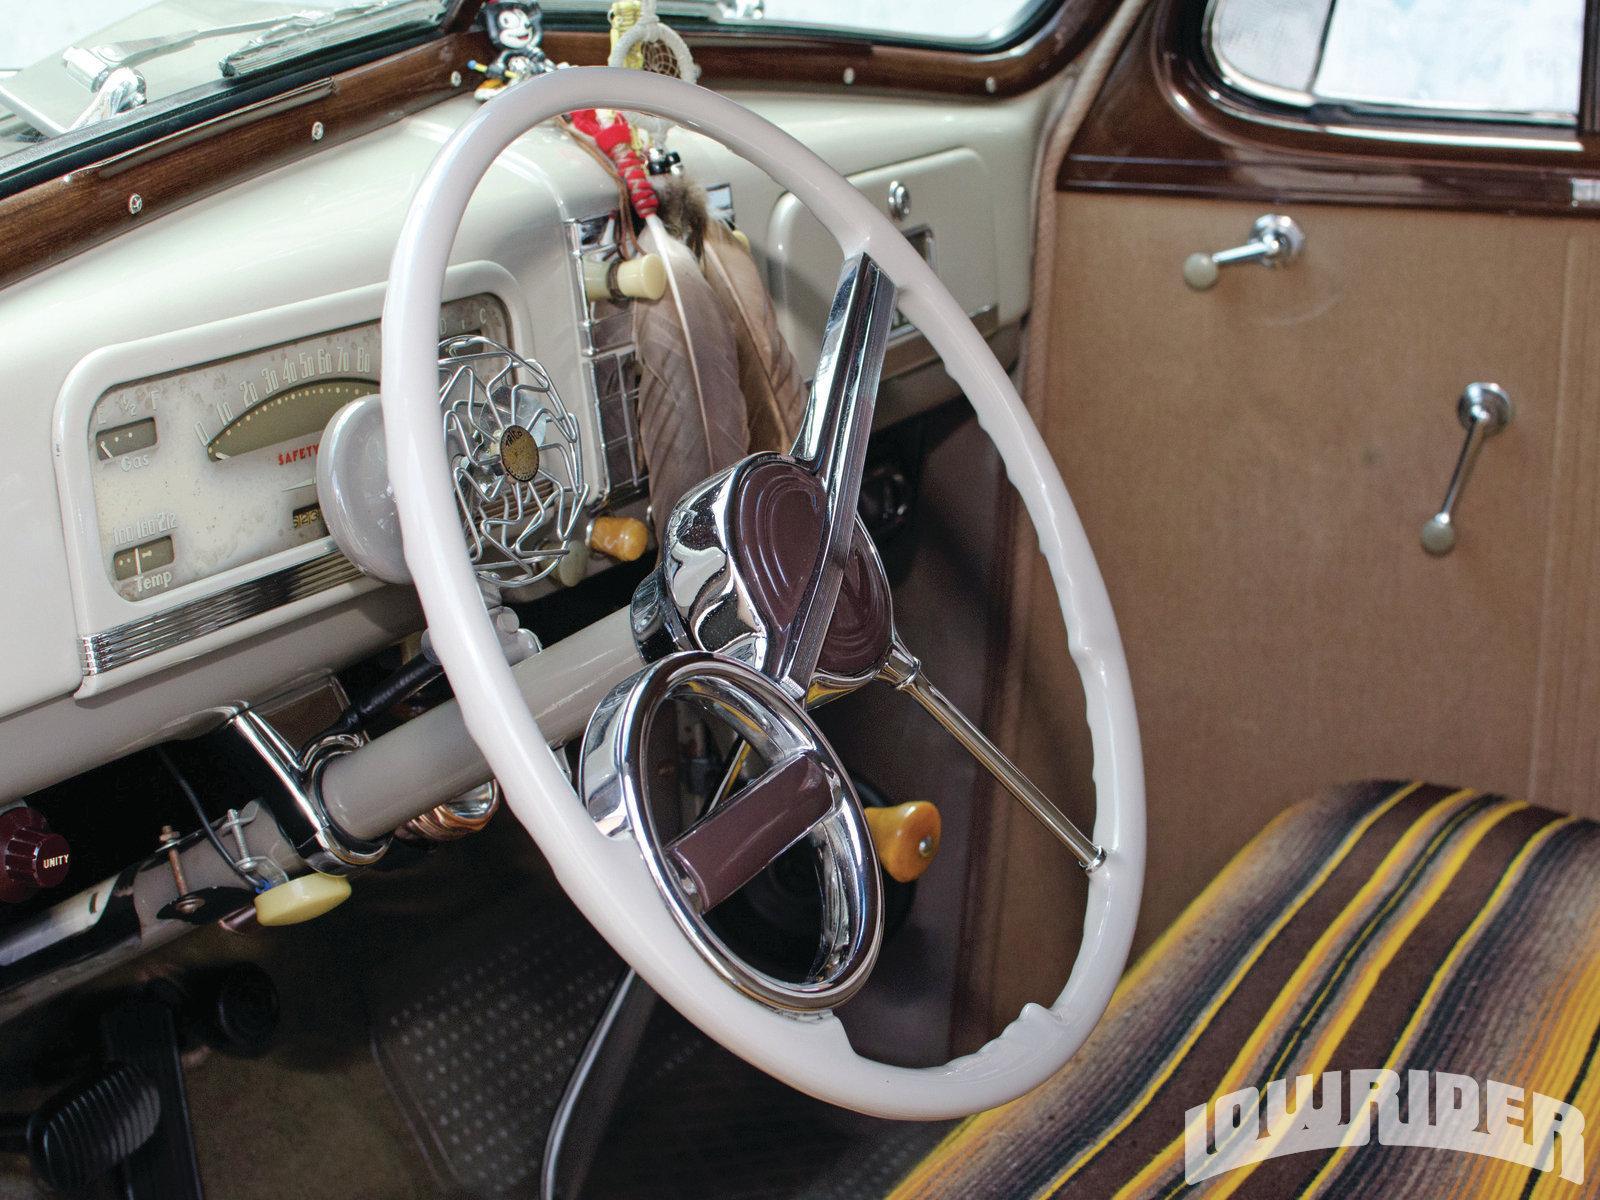 1938 Chevrolet Master Deluxe - Lowrider Magazine